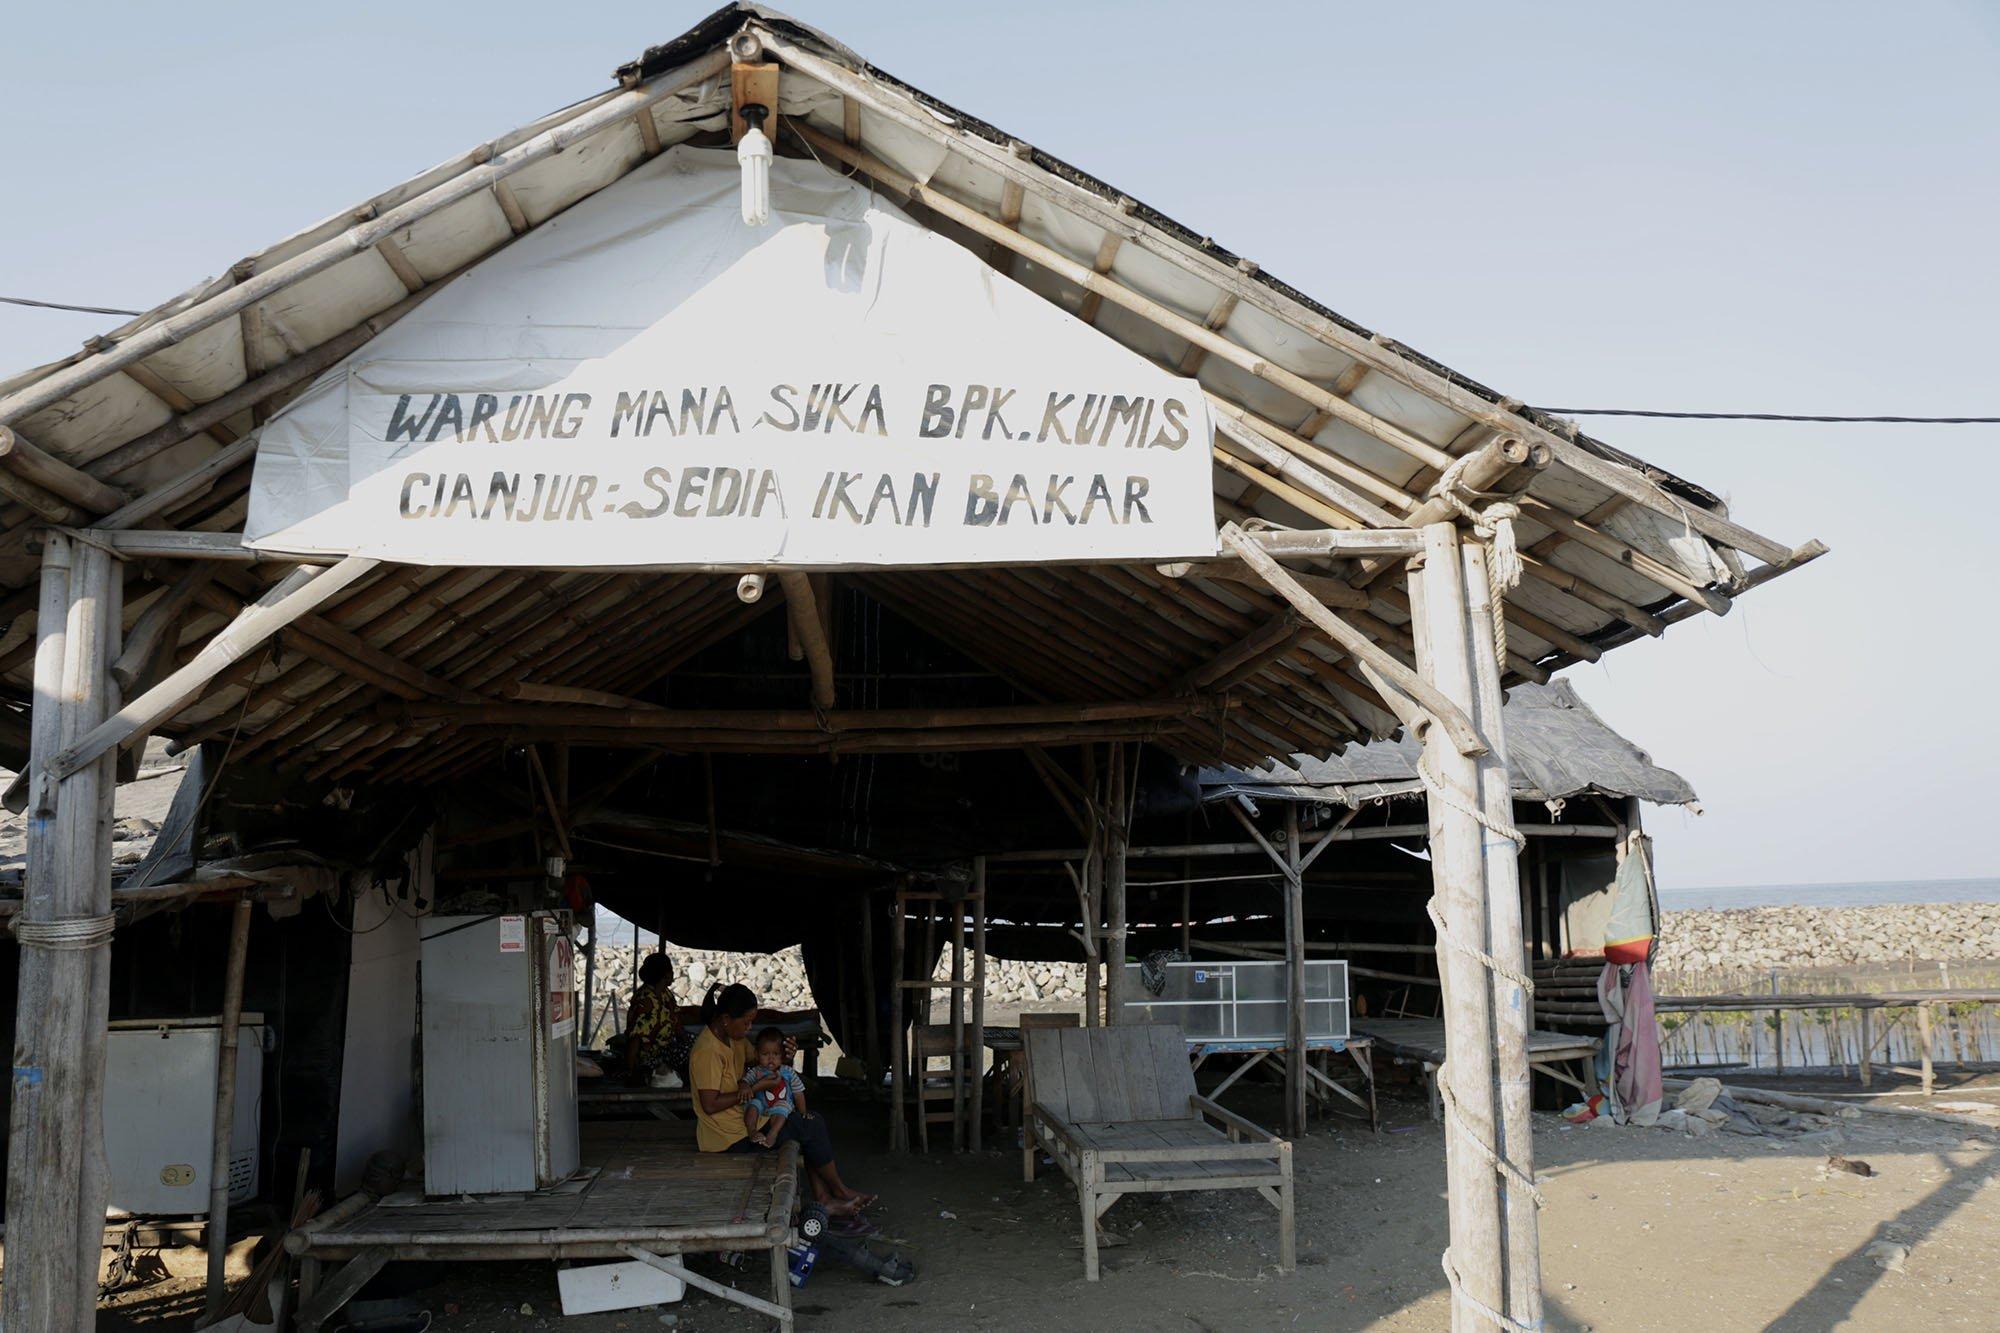 Rumah makan yang sudah tidak aktif lagi karena terdampak tumpahan minyak Pertamina ONWJ di Pantai Cemarajaya, Karawang, Jawa Barat (19/8).